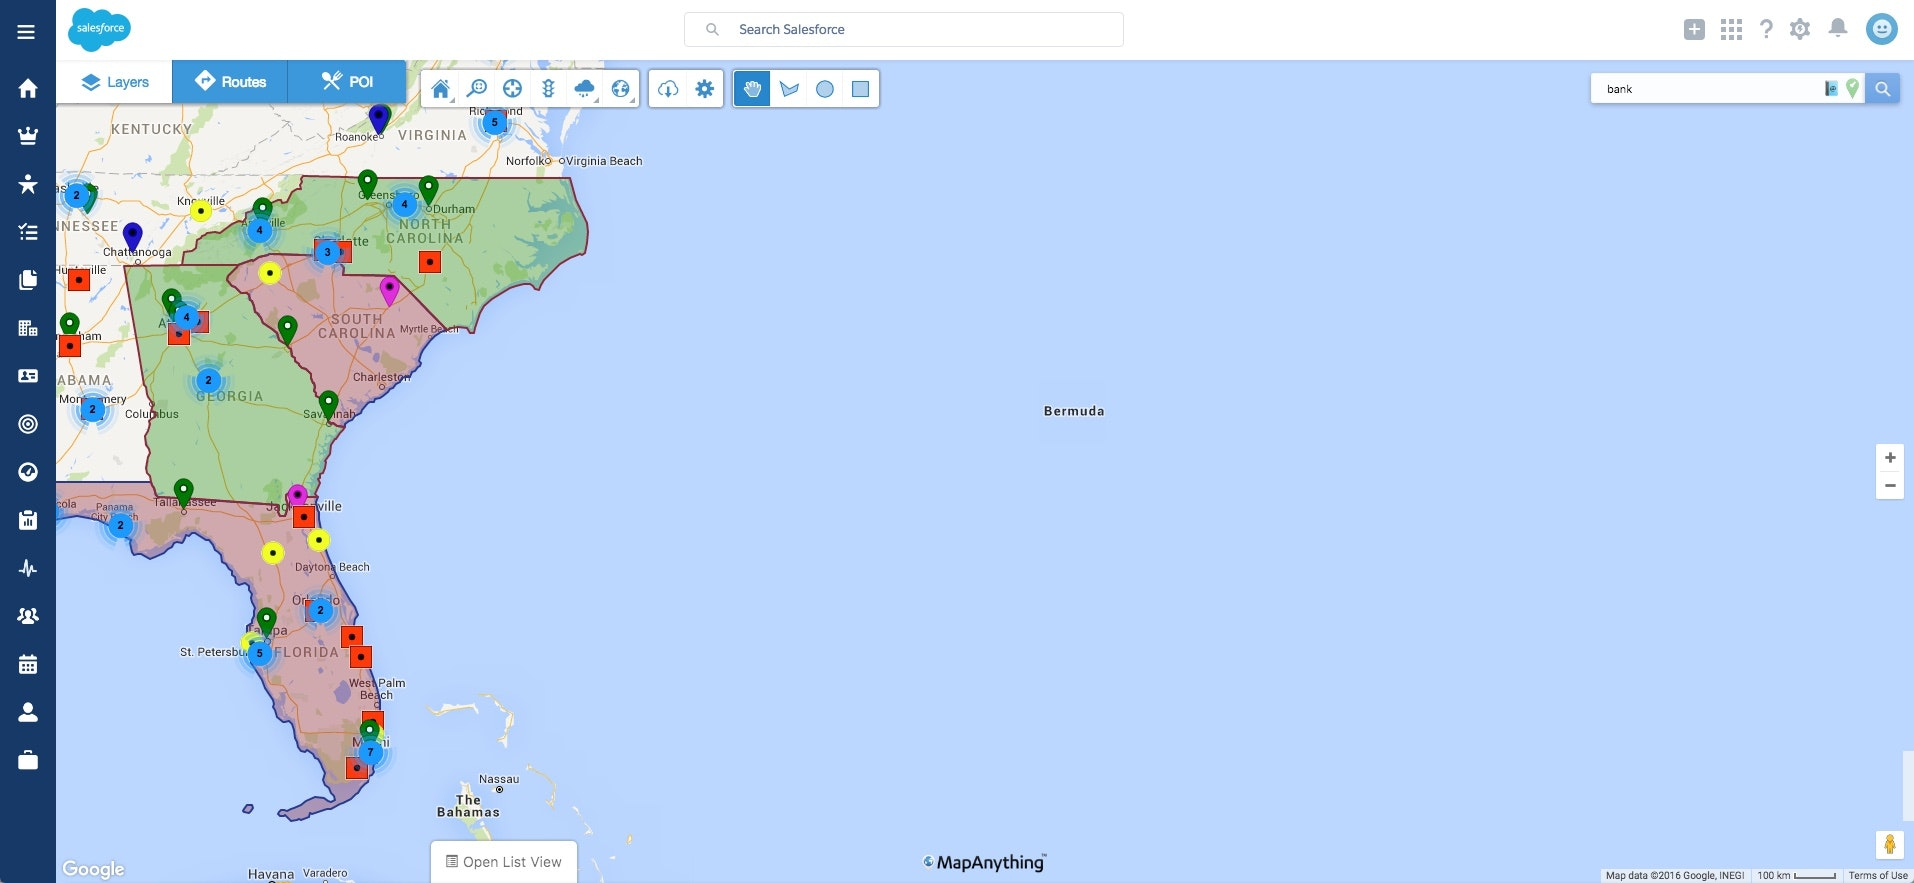 Location based prospecting